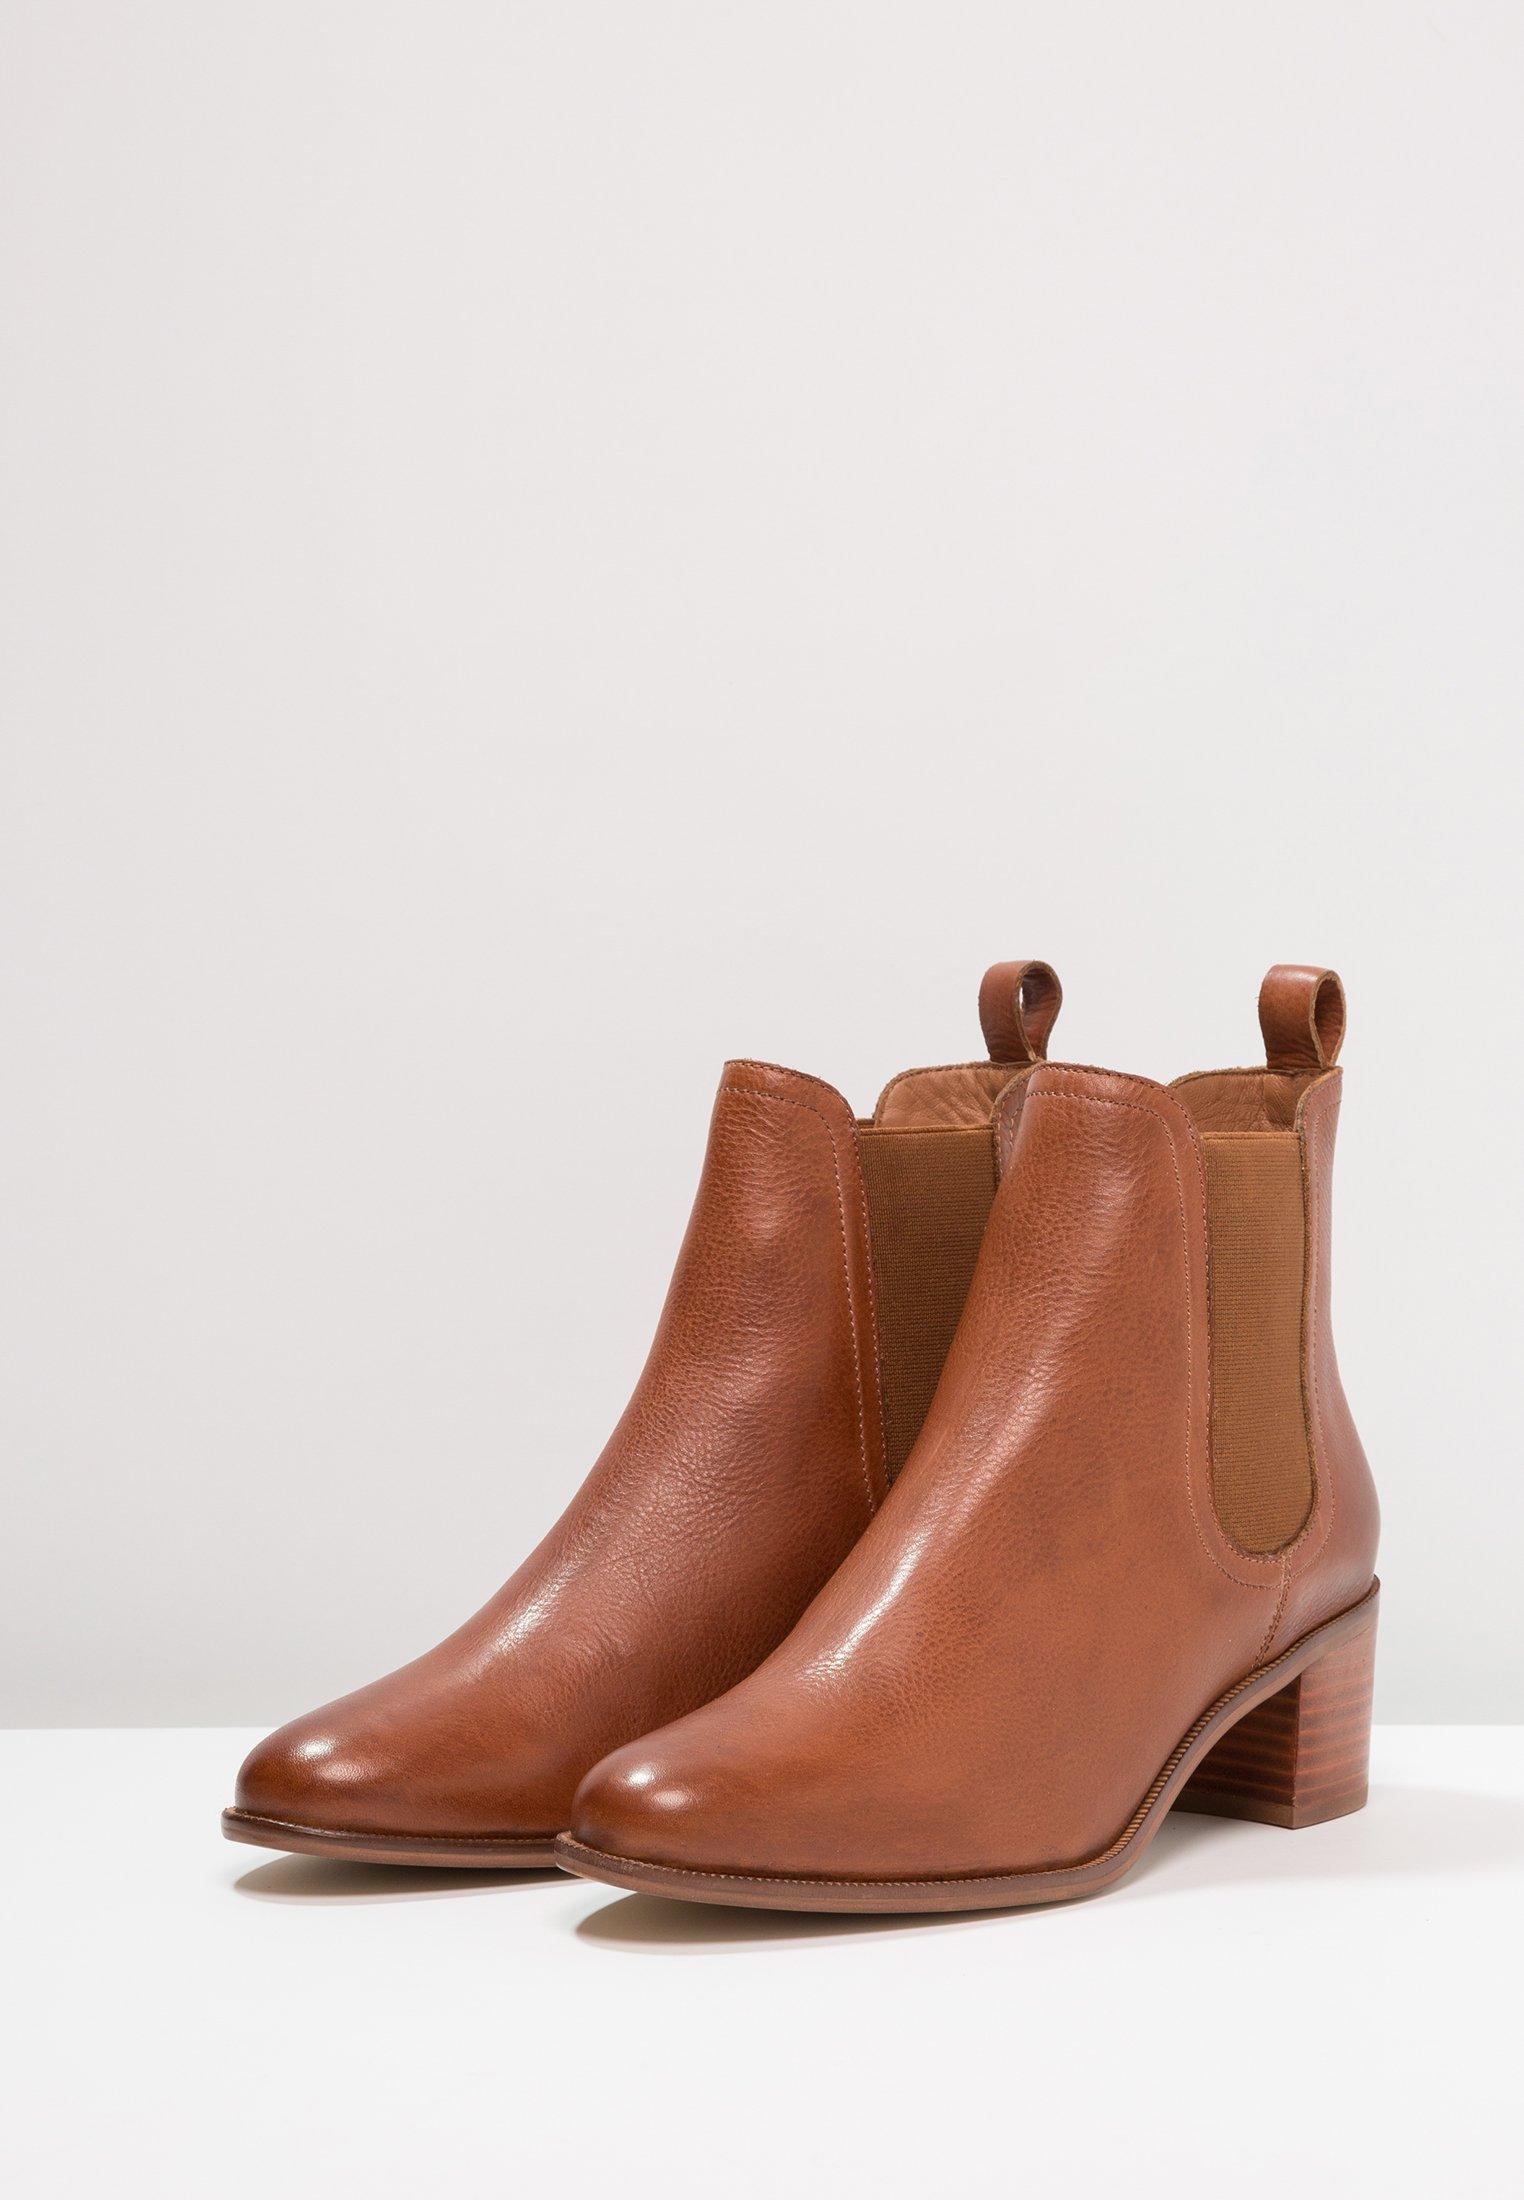 TalonsCognac À Boots Boots Kiomi Kiomi Kiomi TalonsCognac À rdCBexo